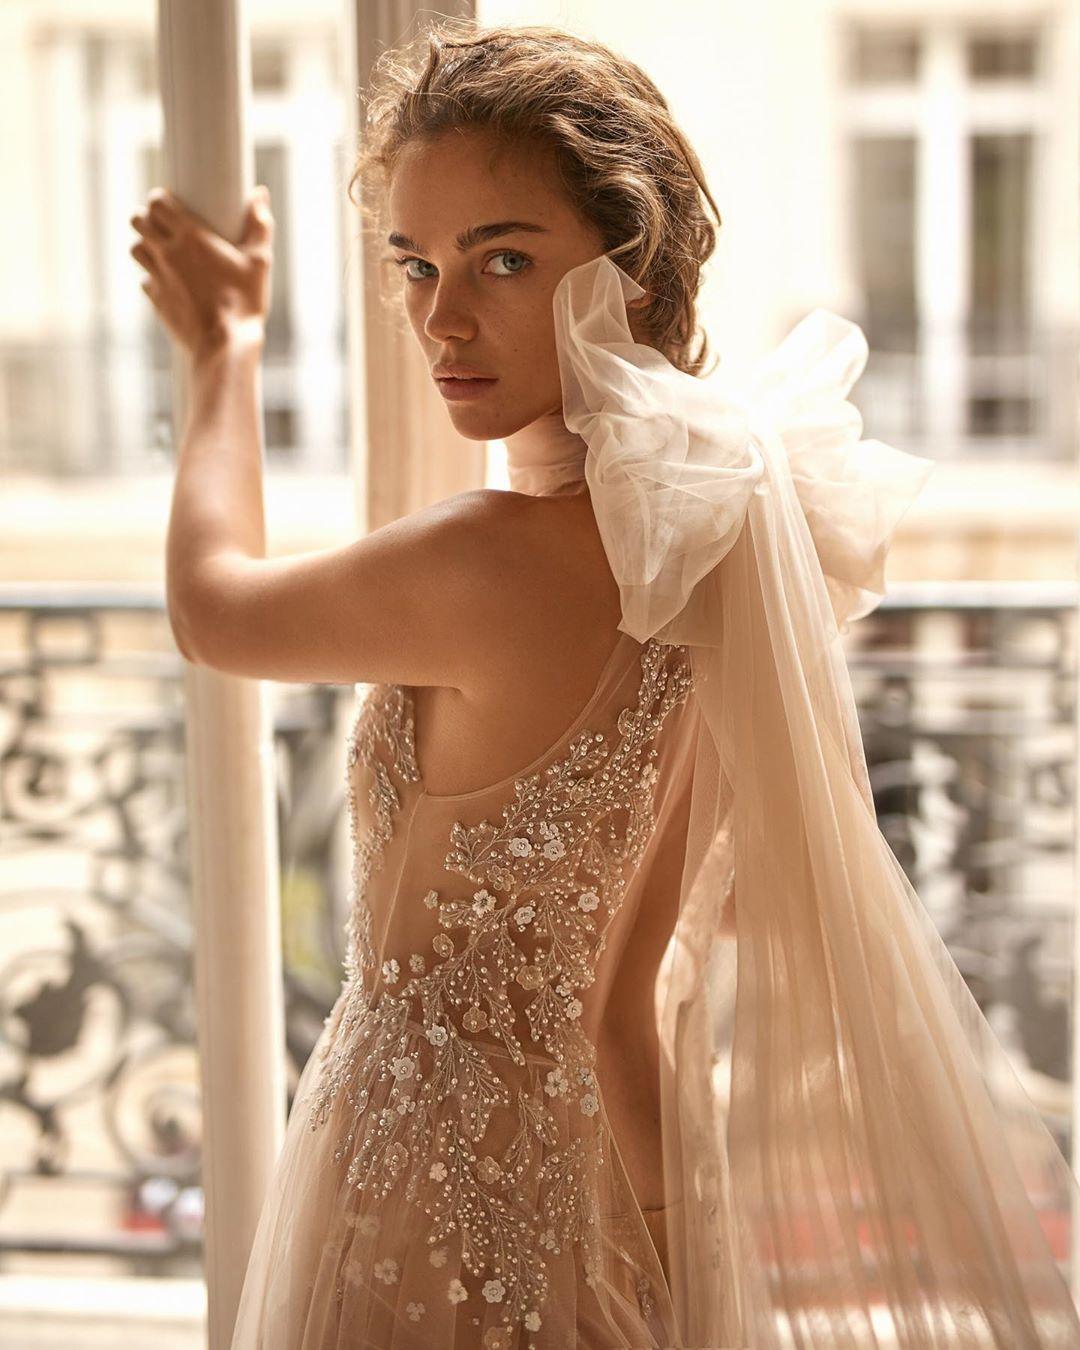 Liz Martinez 2019 Wedding Dresses: 20 Wedding Dresses With Bows Spotted At Bridal Fashion Week